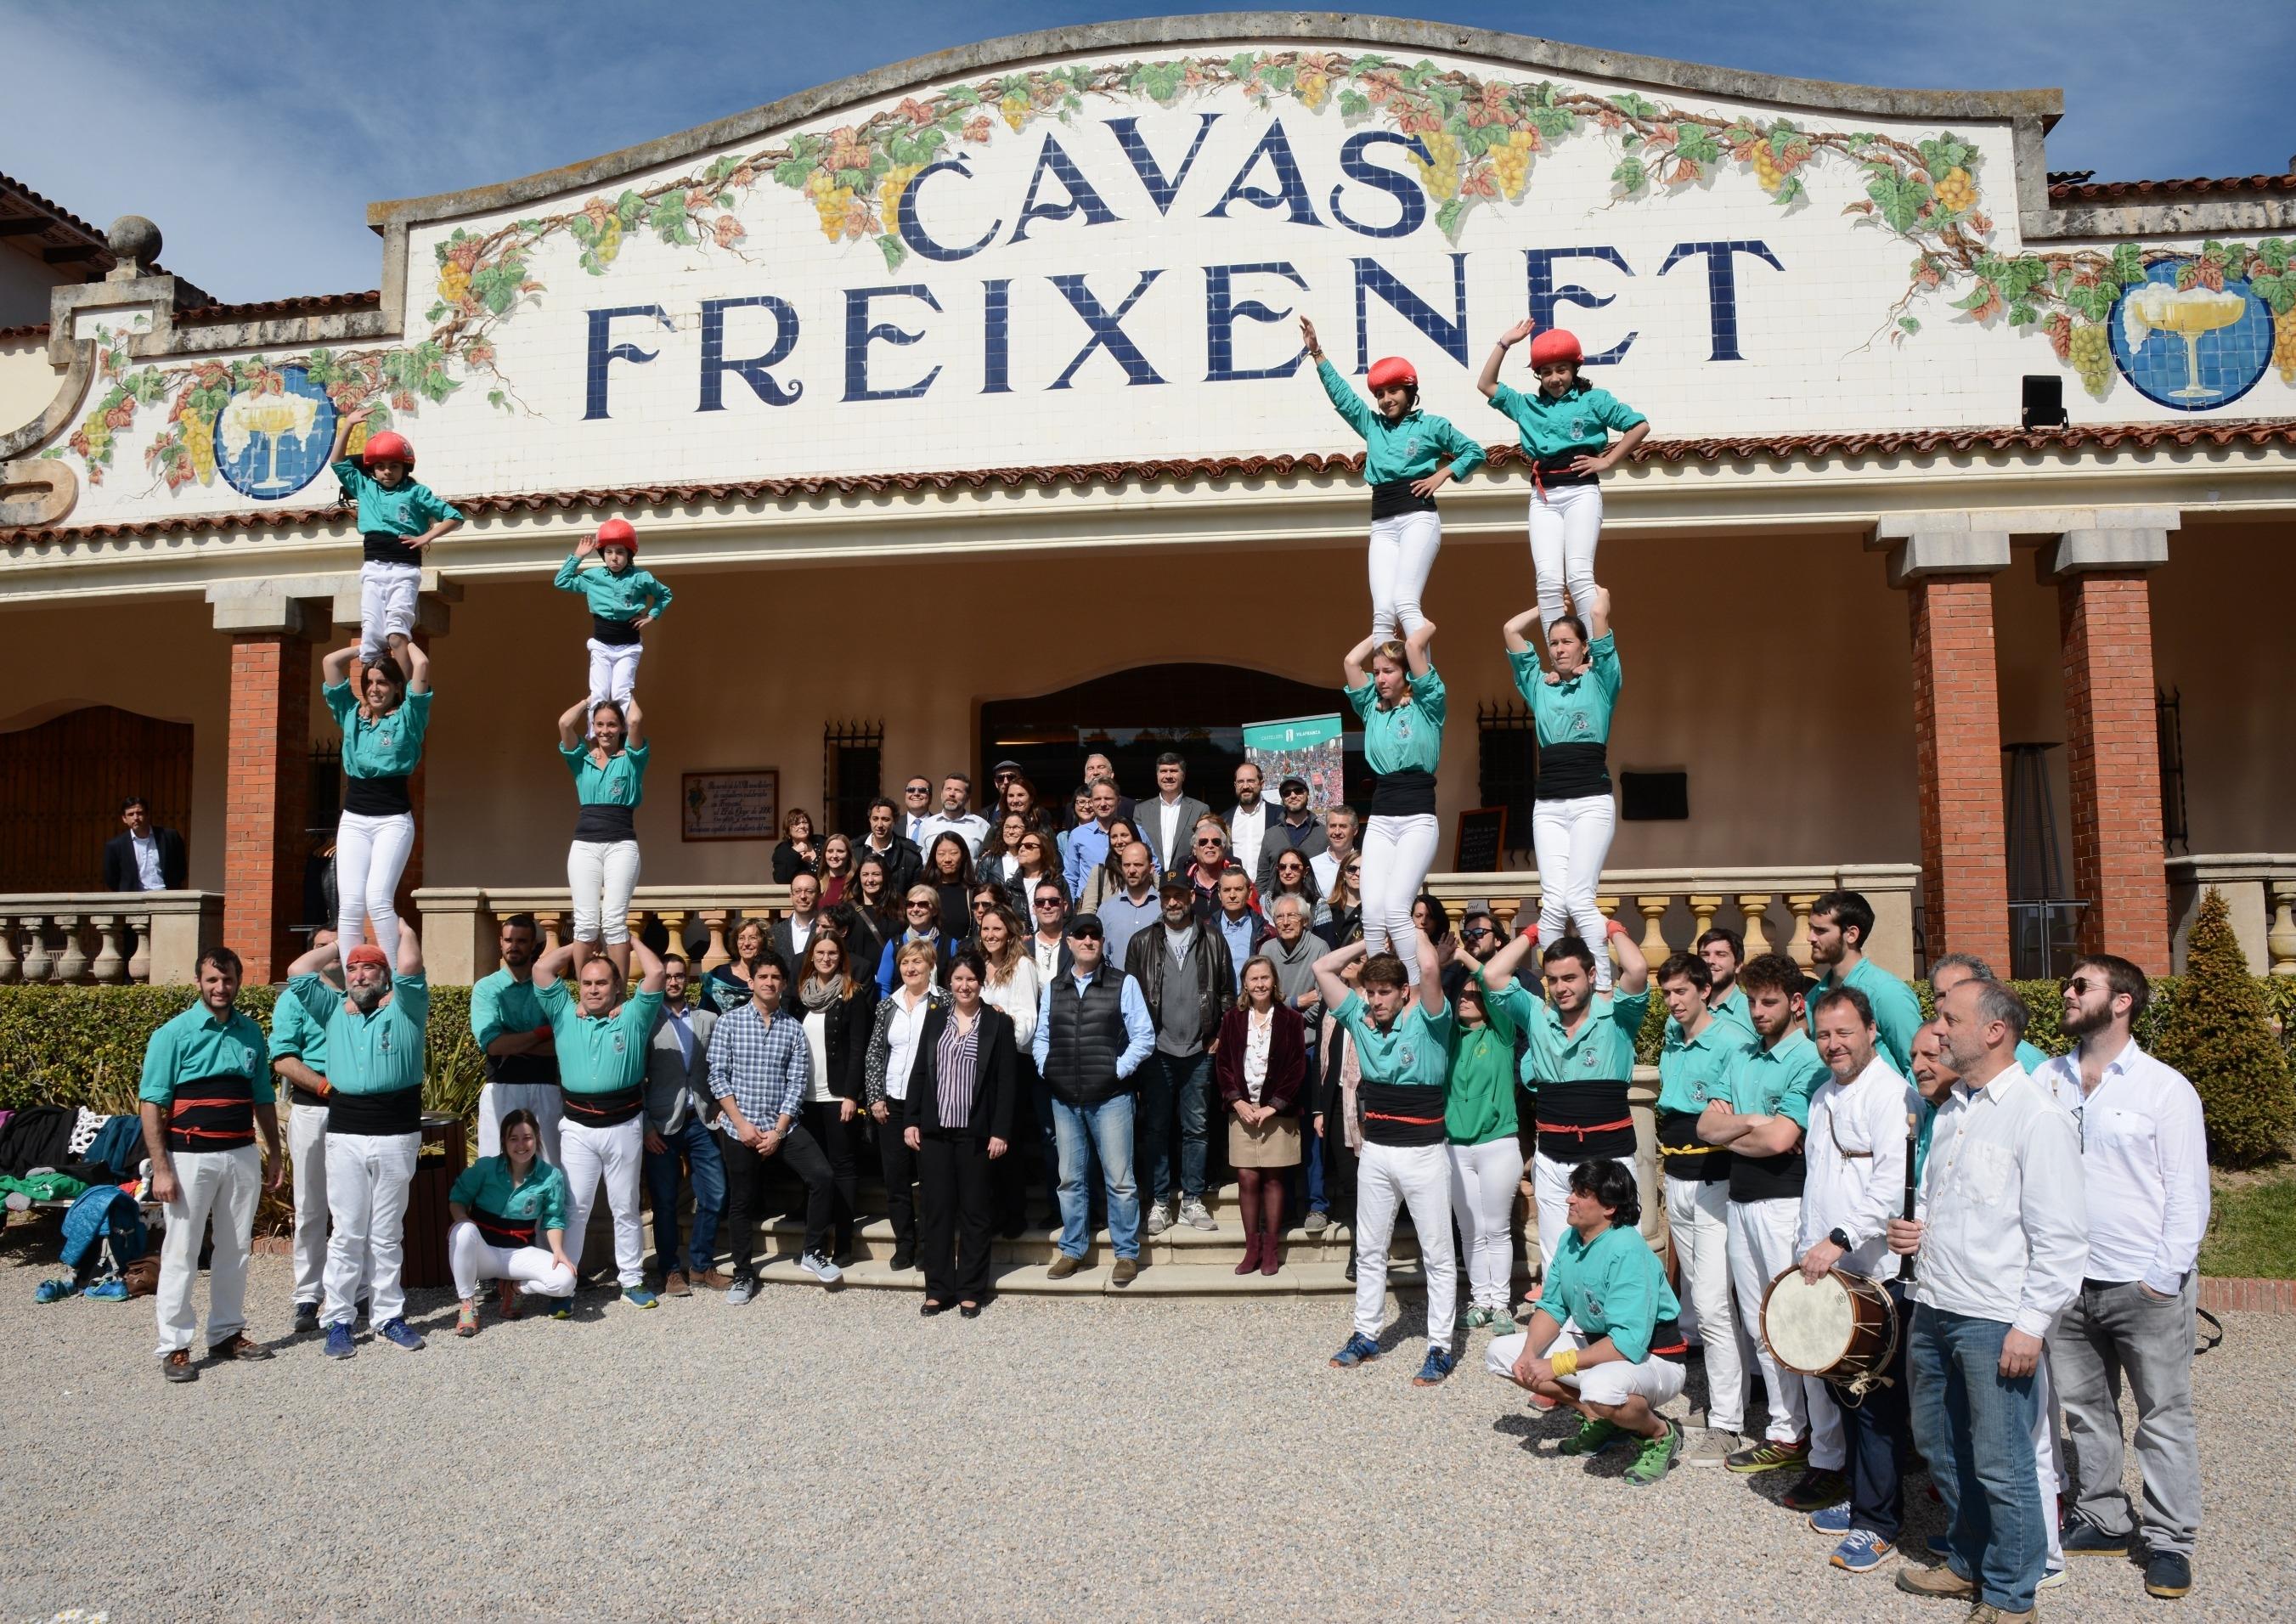 Freixenet promotes the Penedès region